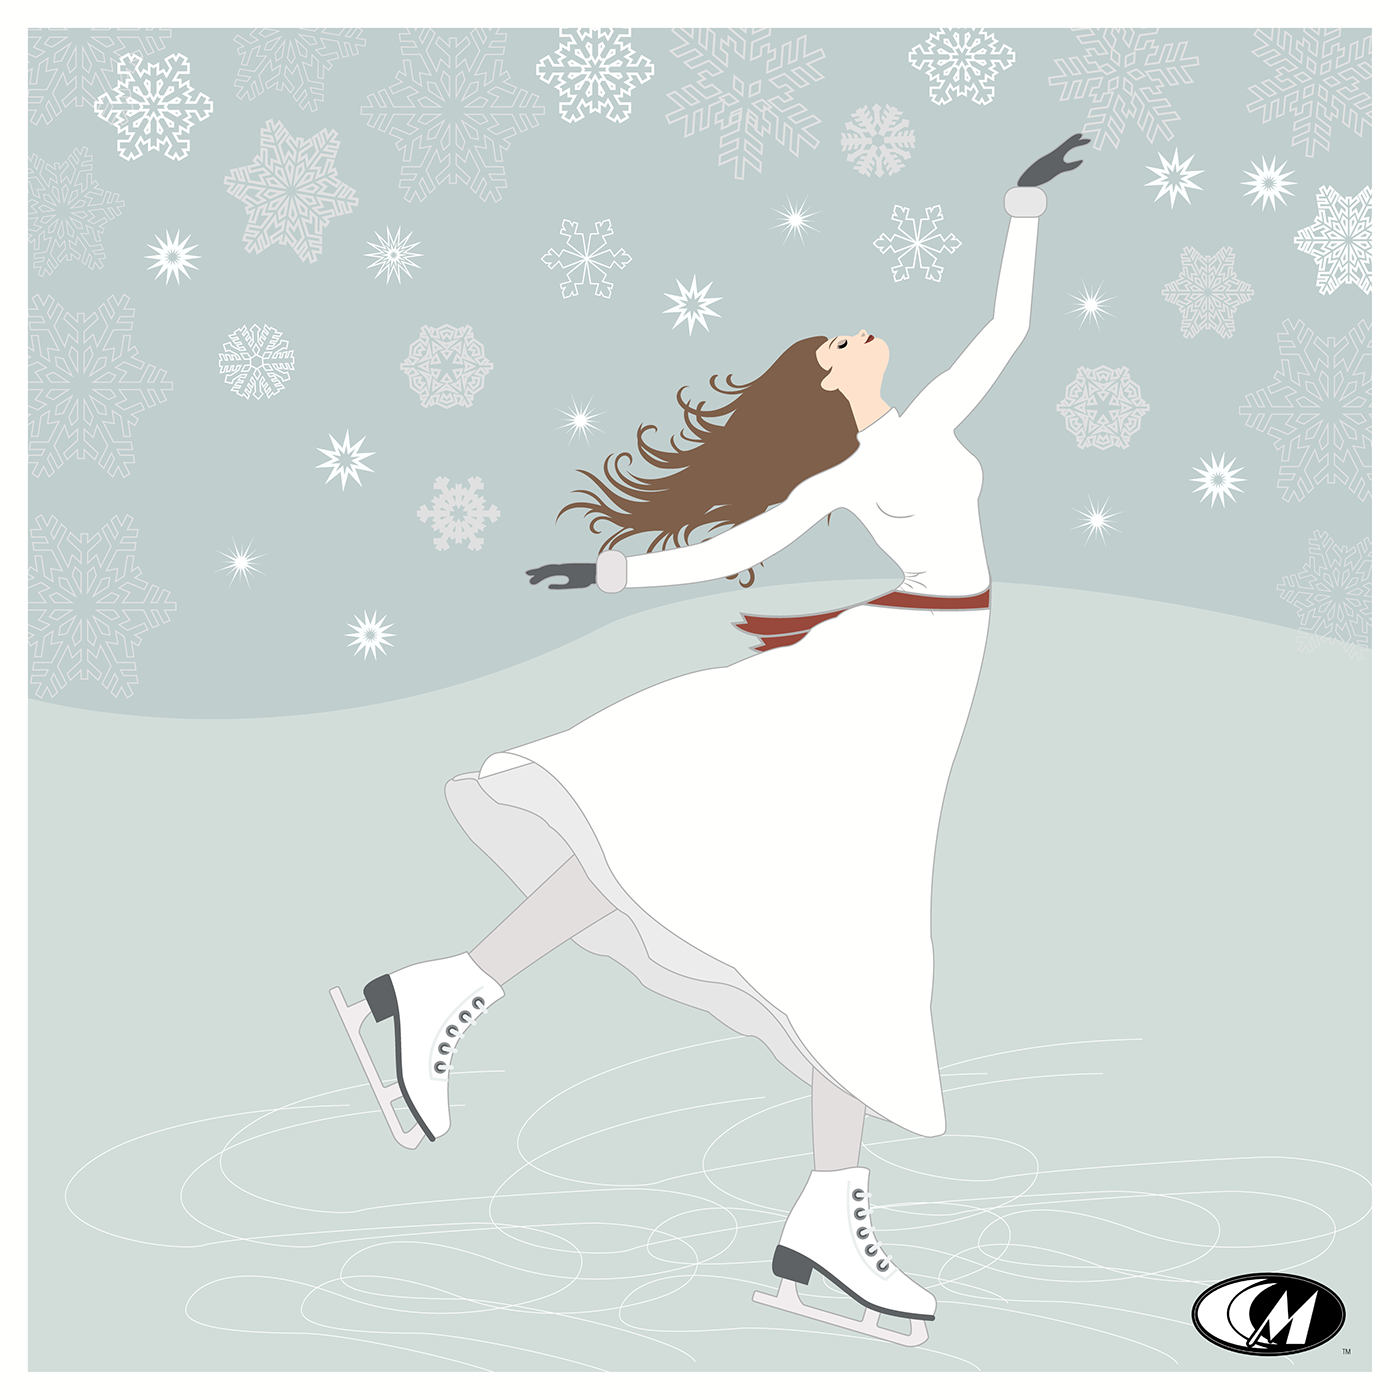 ILLUSTRATION  graphic design  Digital Art  skater holiday cards  Collection prints series Winter Wonderland snow